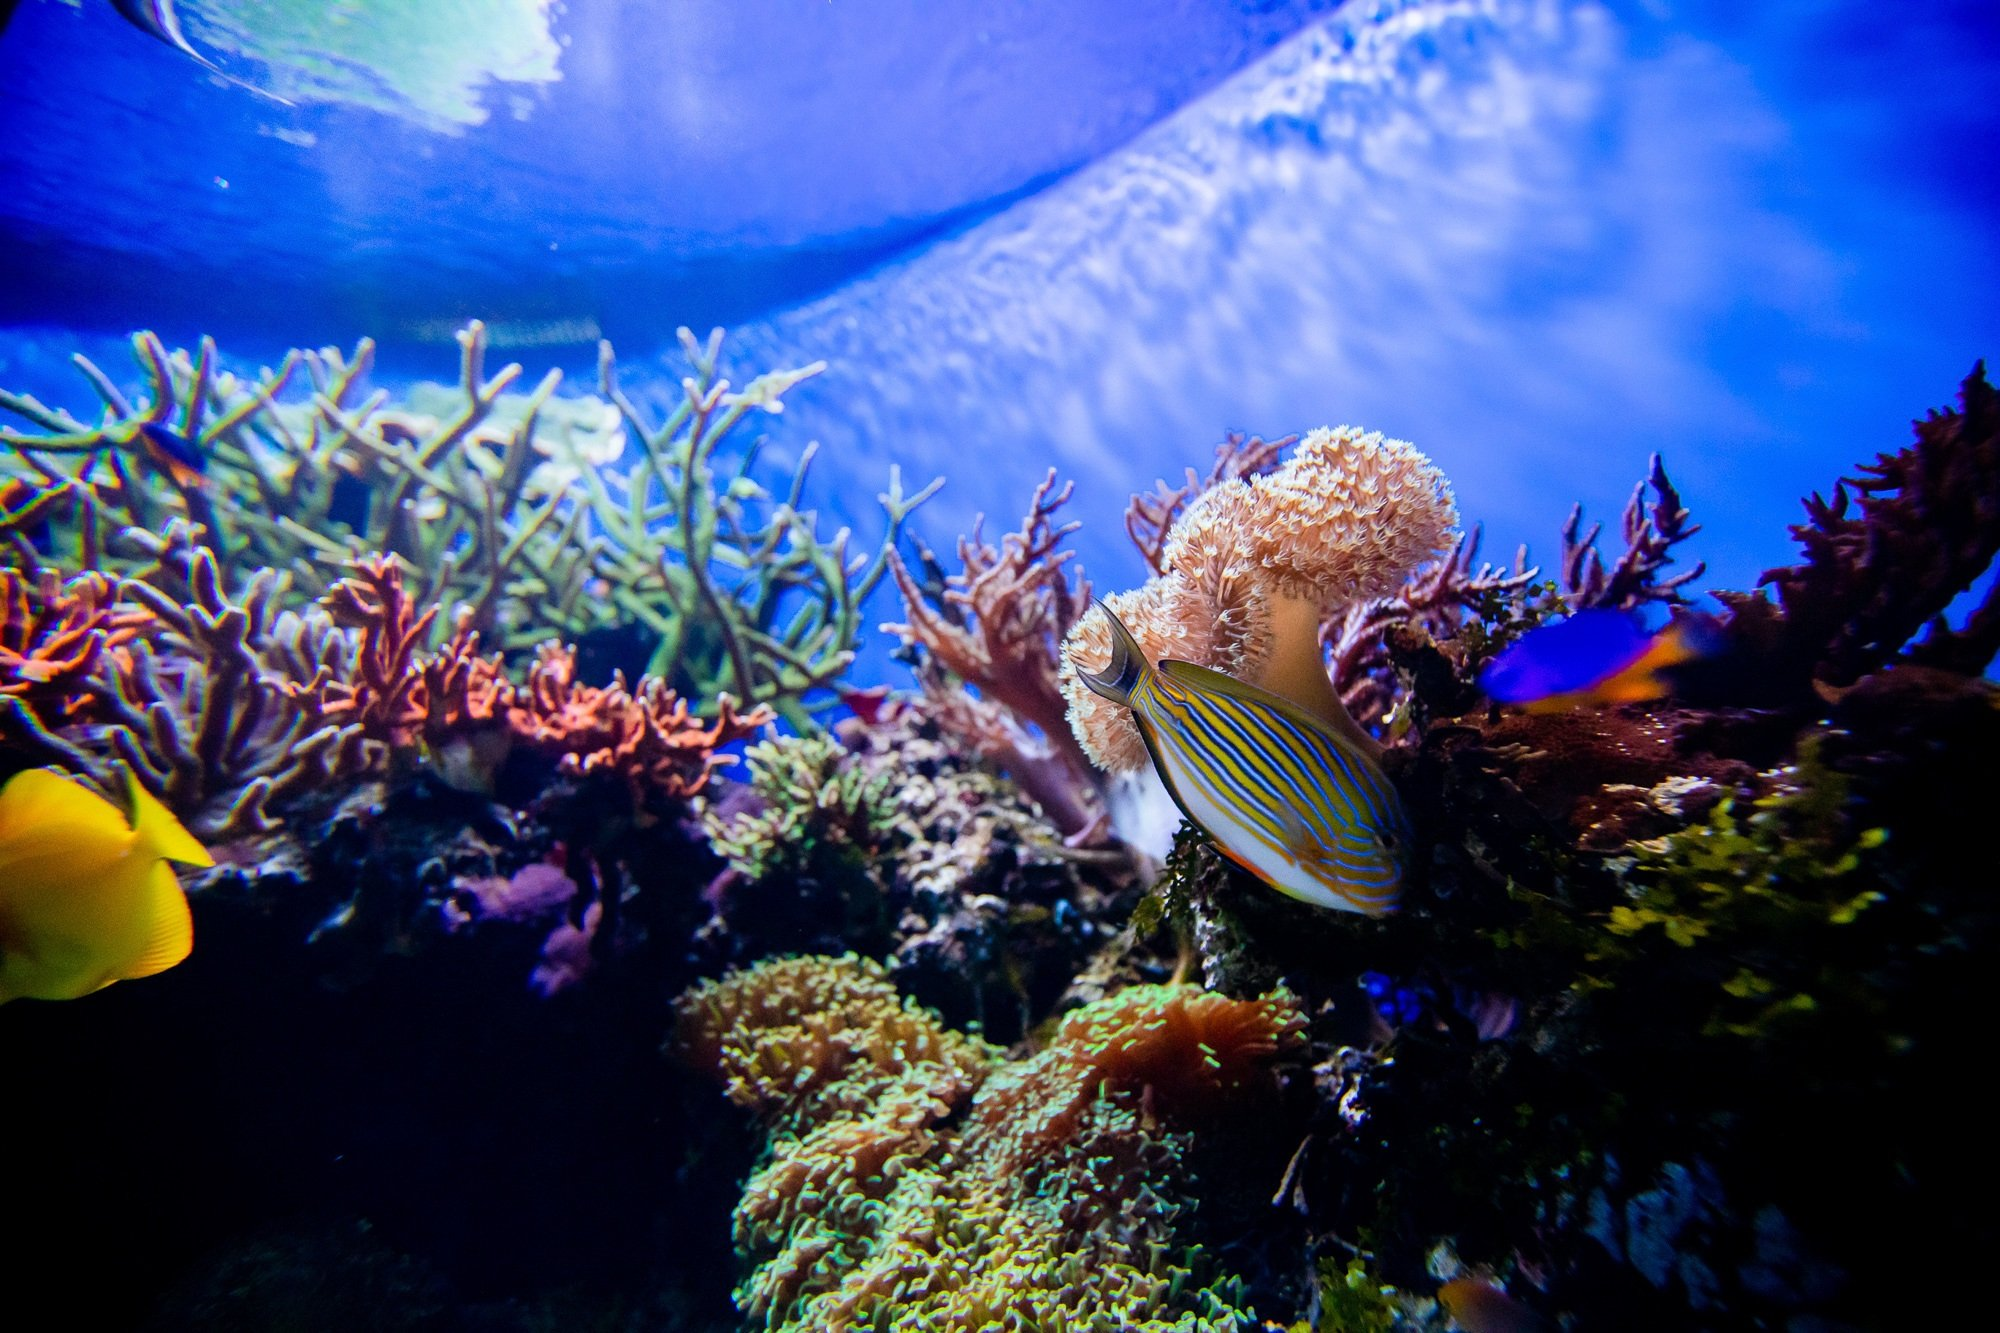 Beautiful fish and coral at Birch Aquarium at Scripps in La Jolla